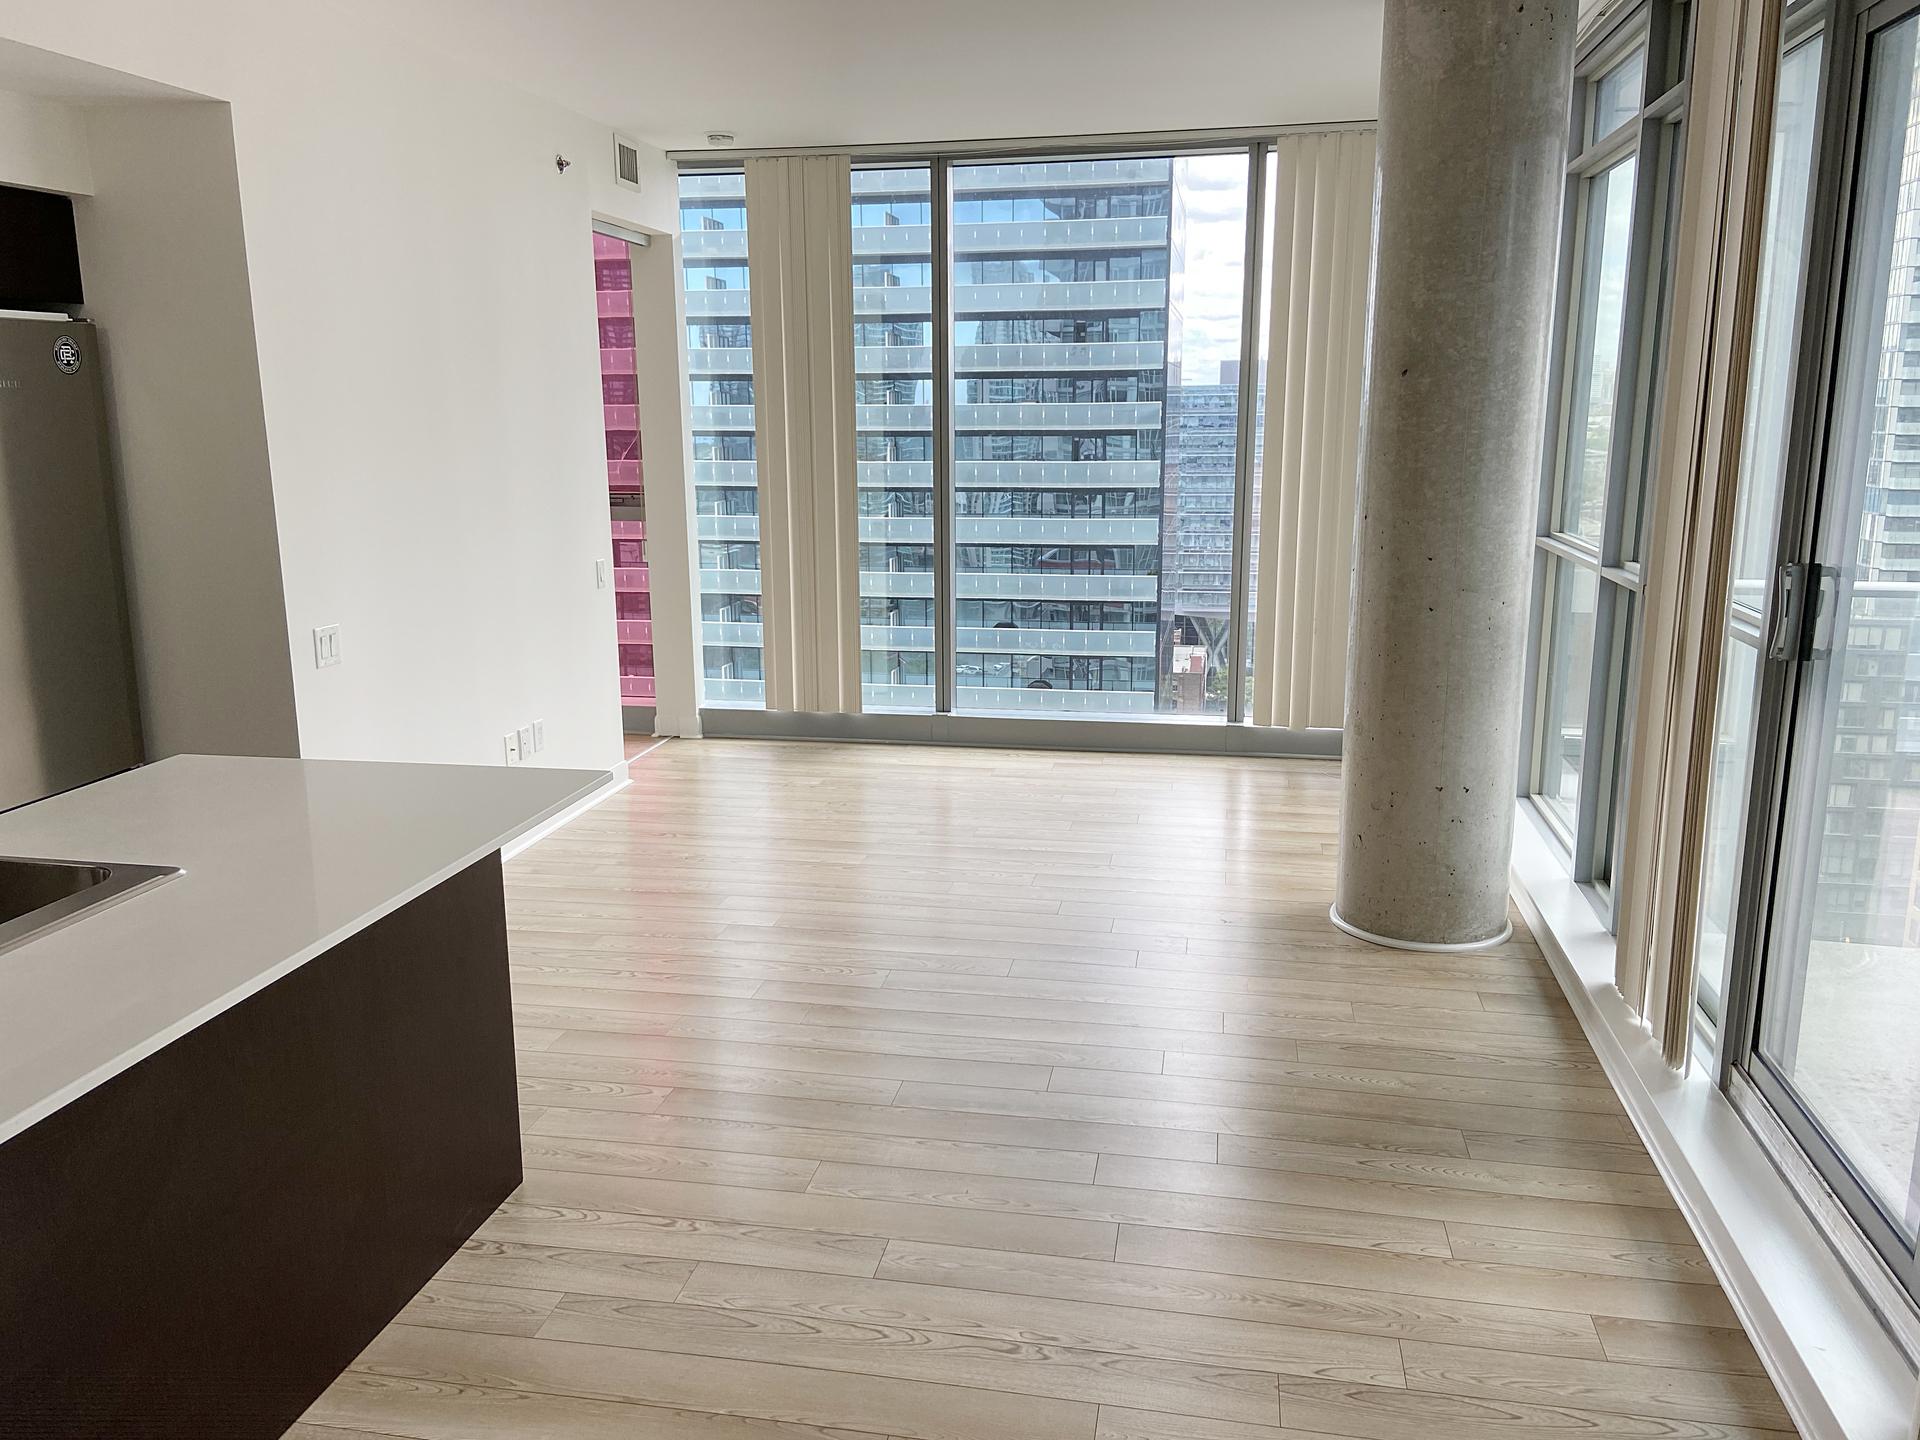 Living Room at 2207 - 375 King Street W, Waterfront Communities C1, Toronto